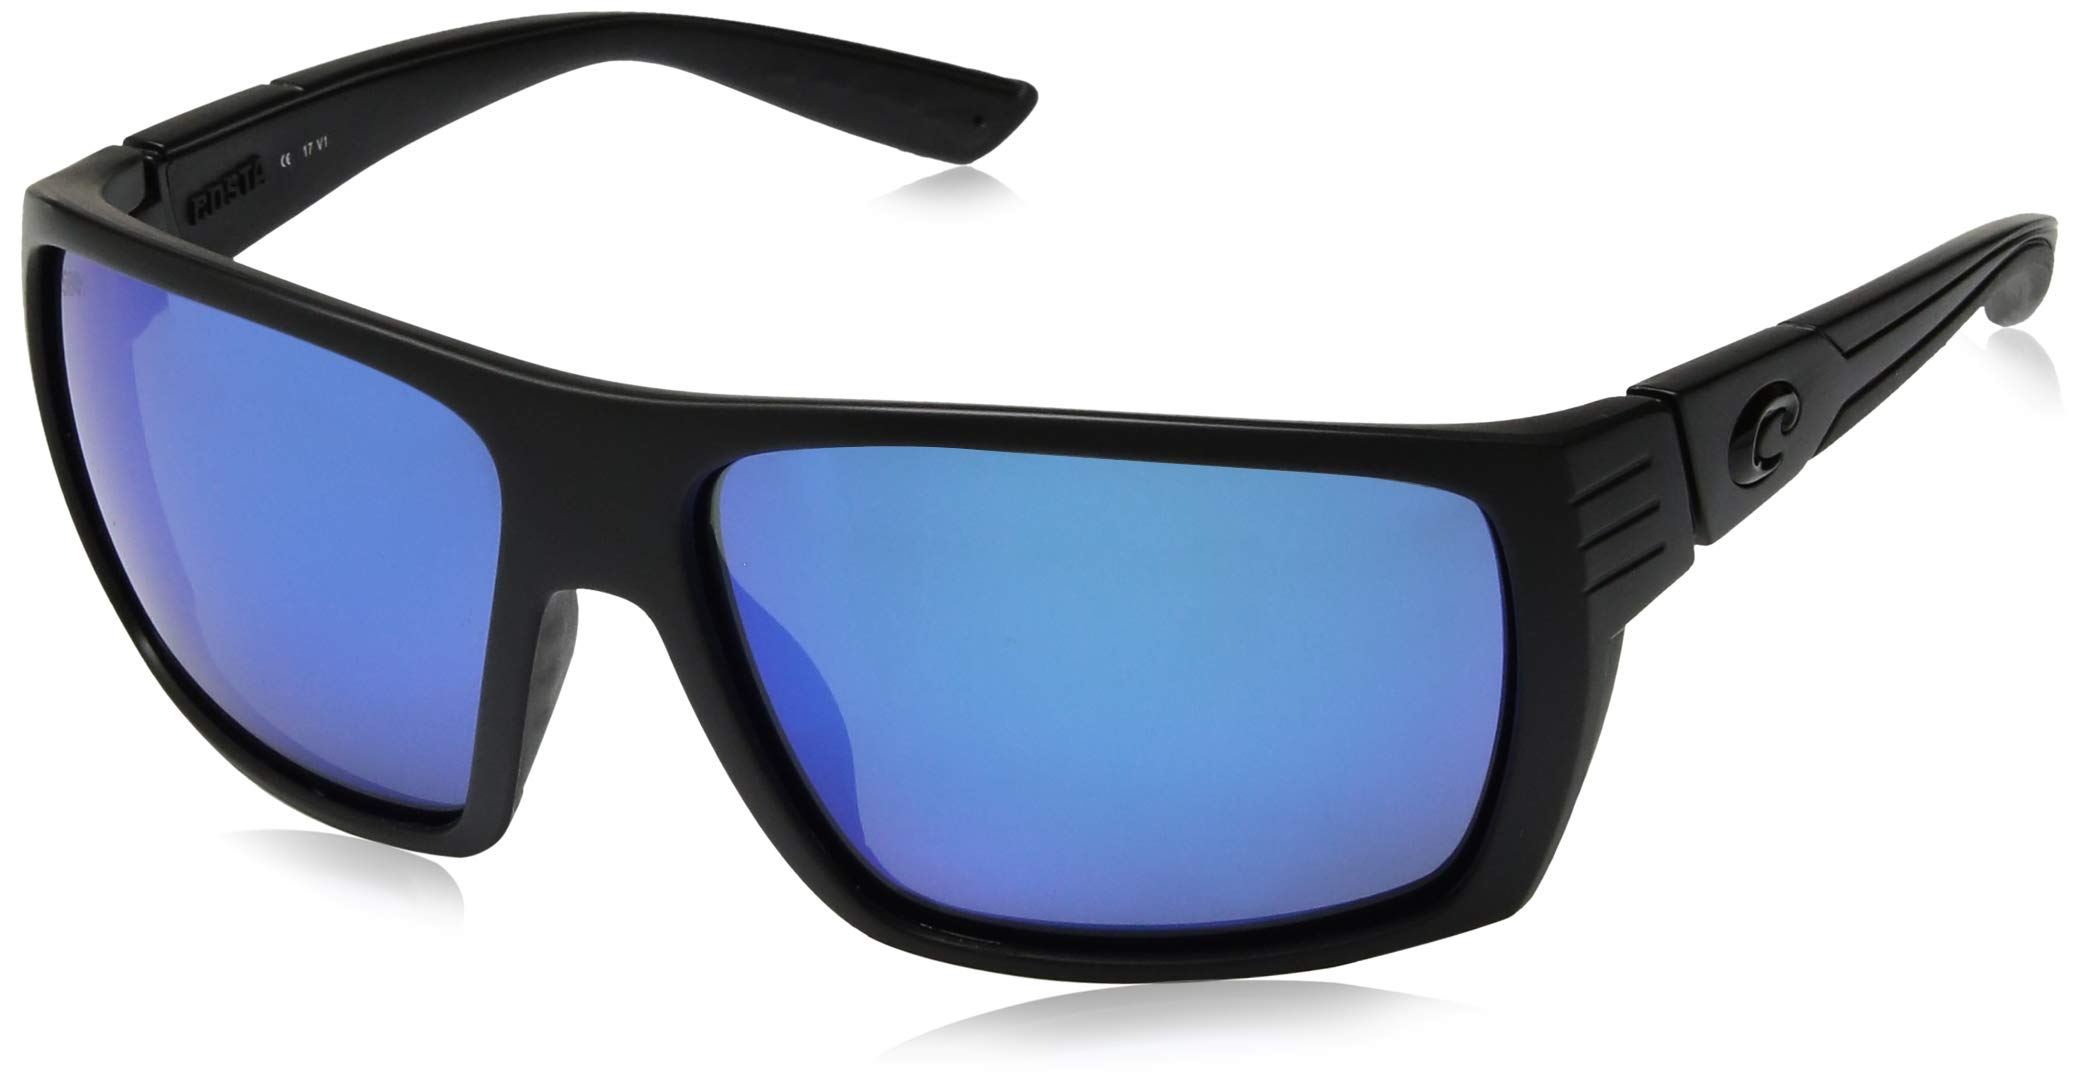 Costa Del Mar Hamlin Sunglasses, Blue Mirror 580 Glass, Blackout by Costa Del Mar